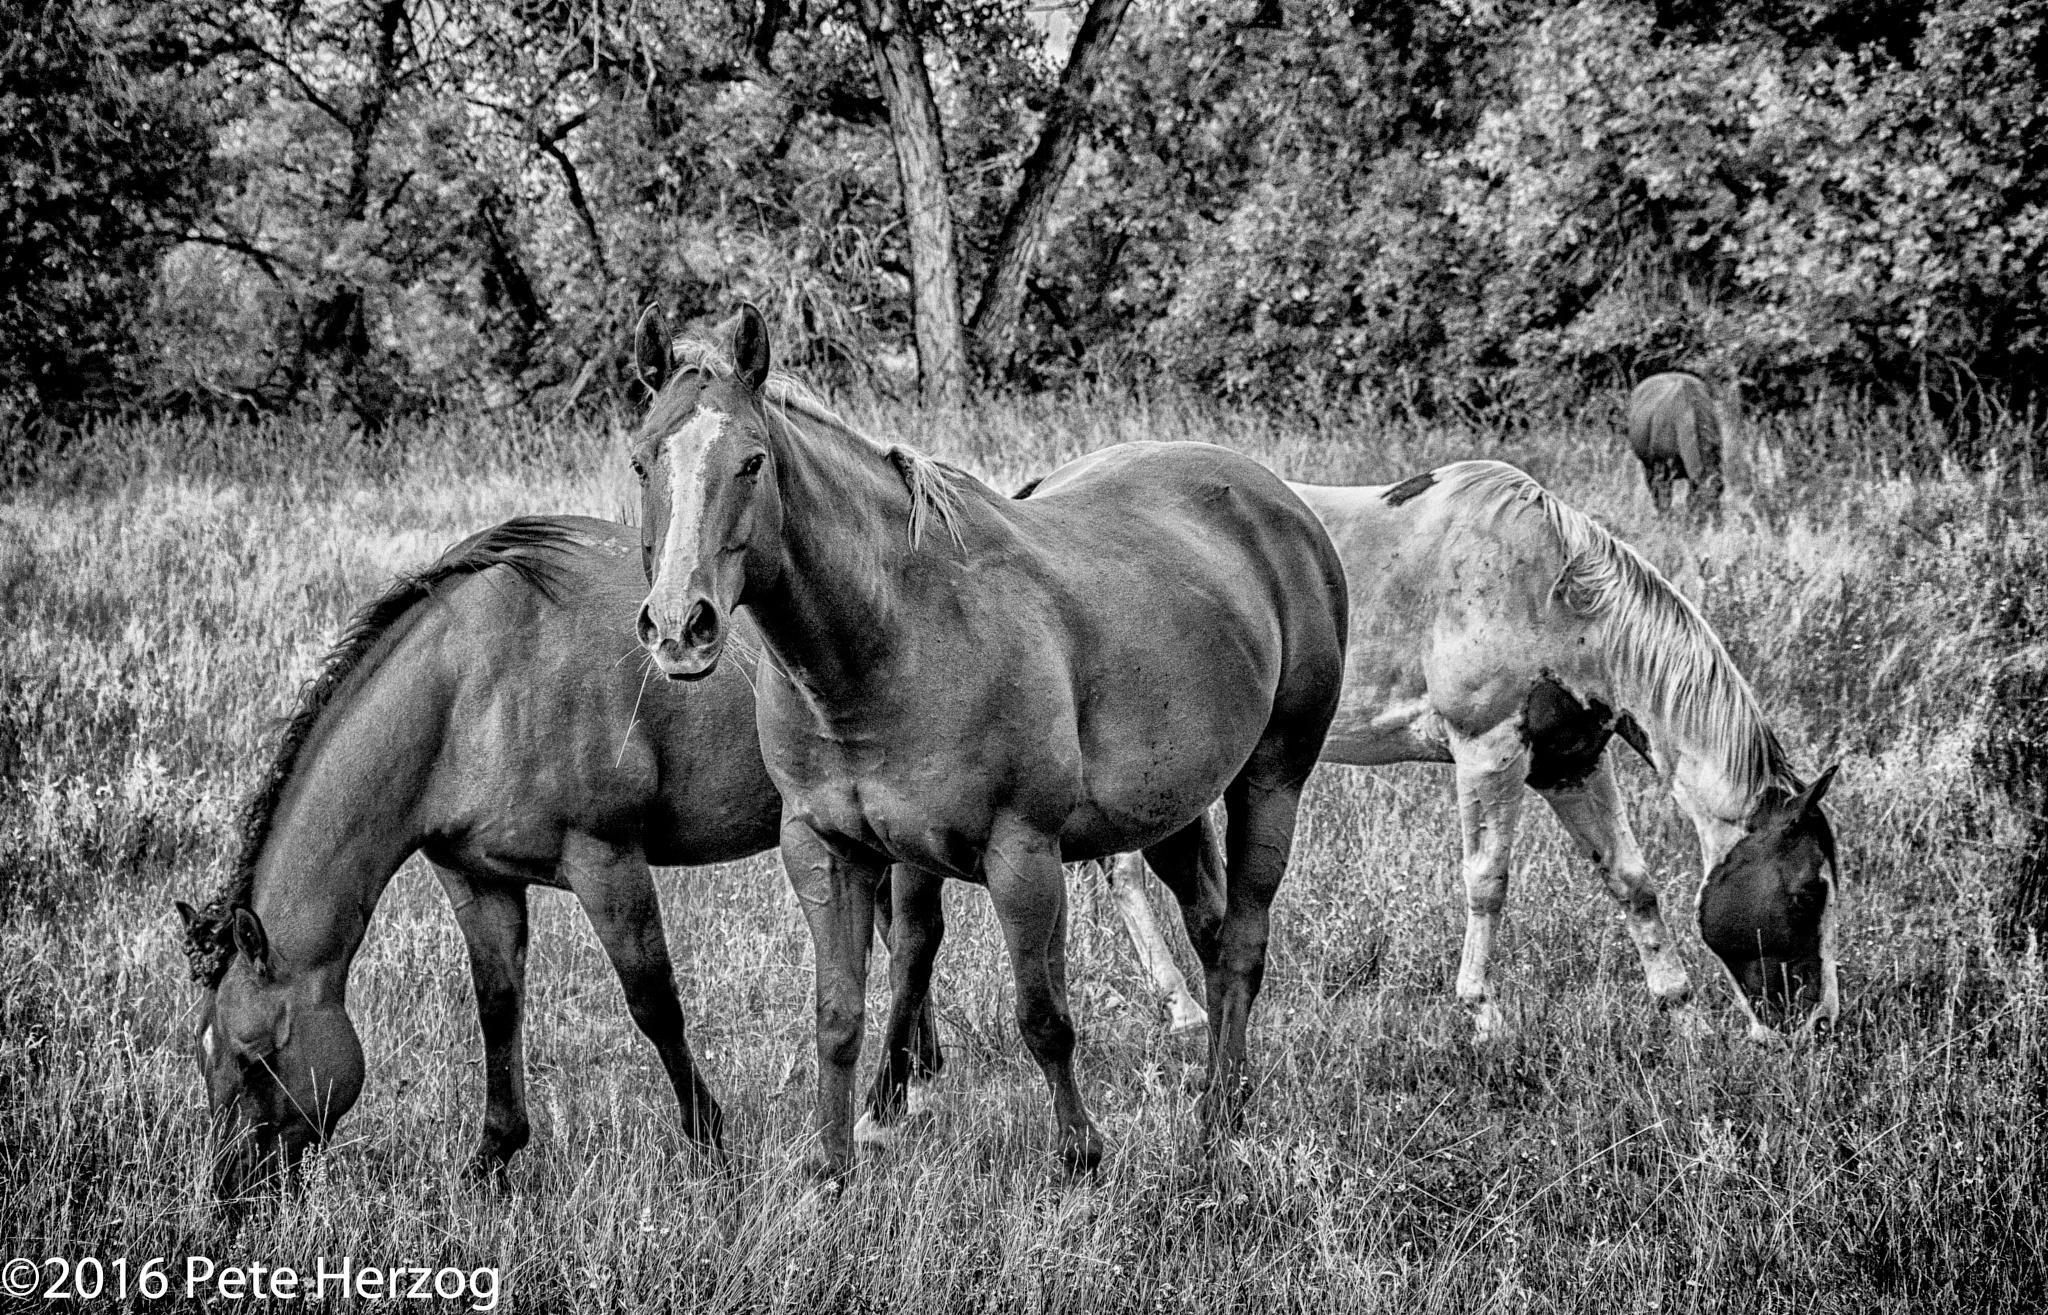 Horses Grazing by peter.herzog.3323